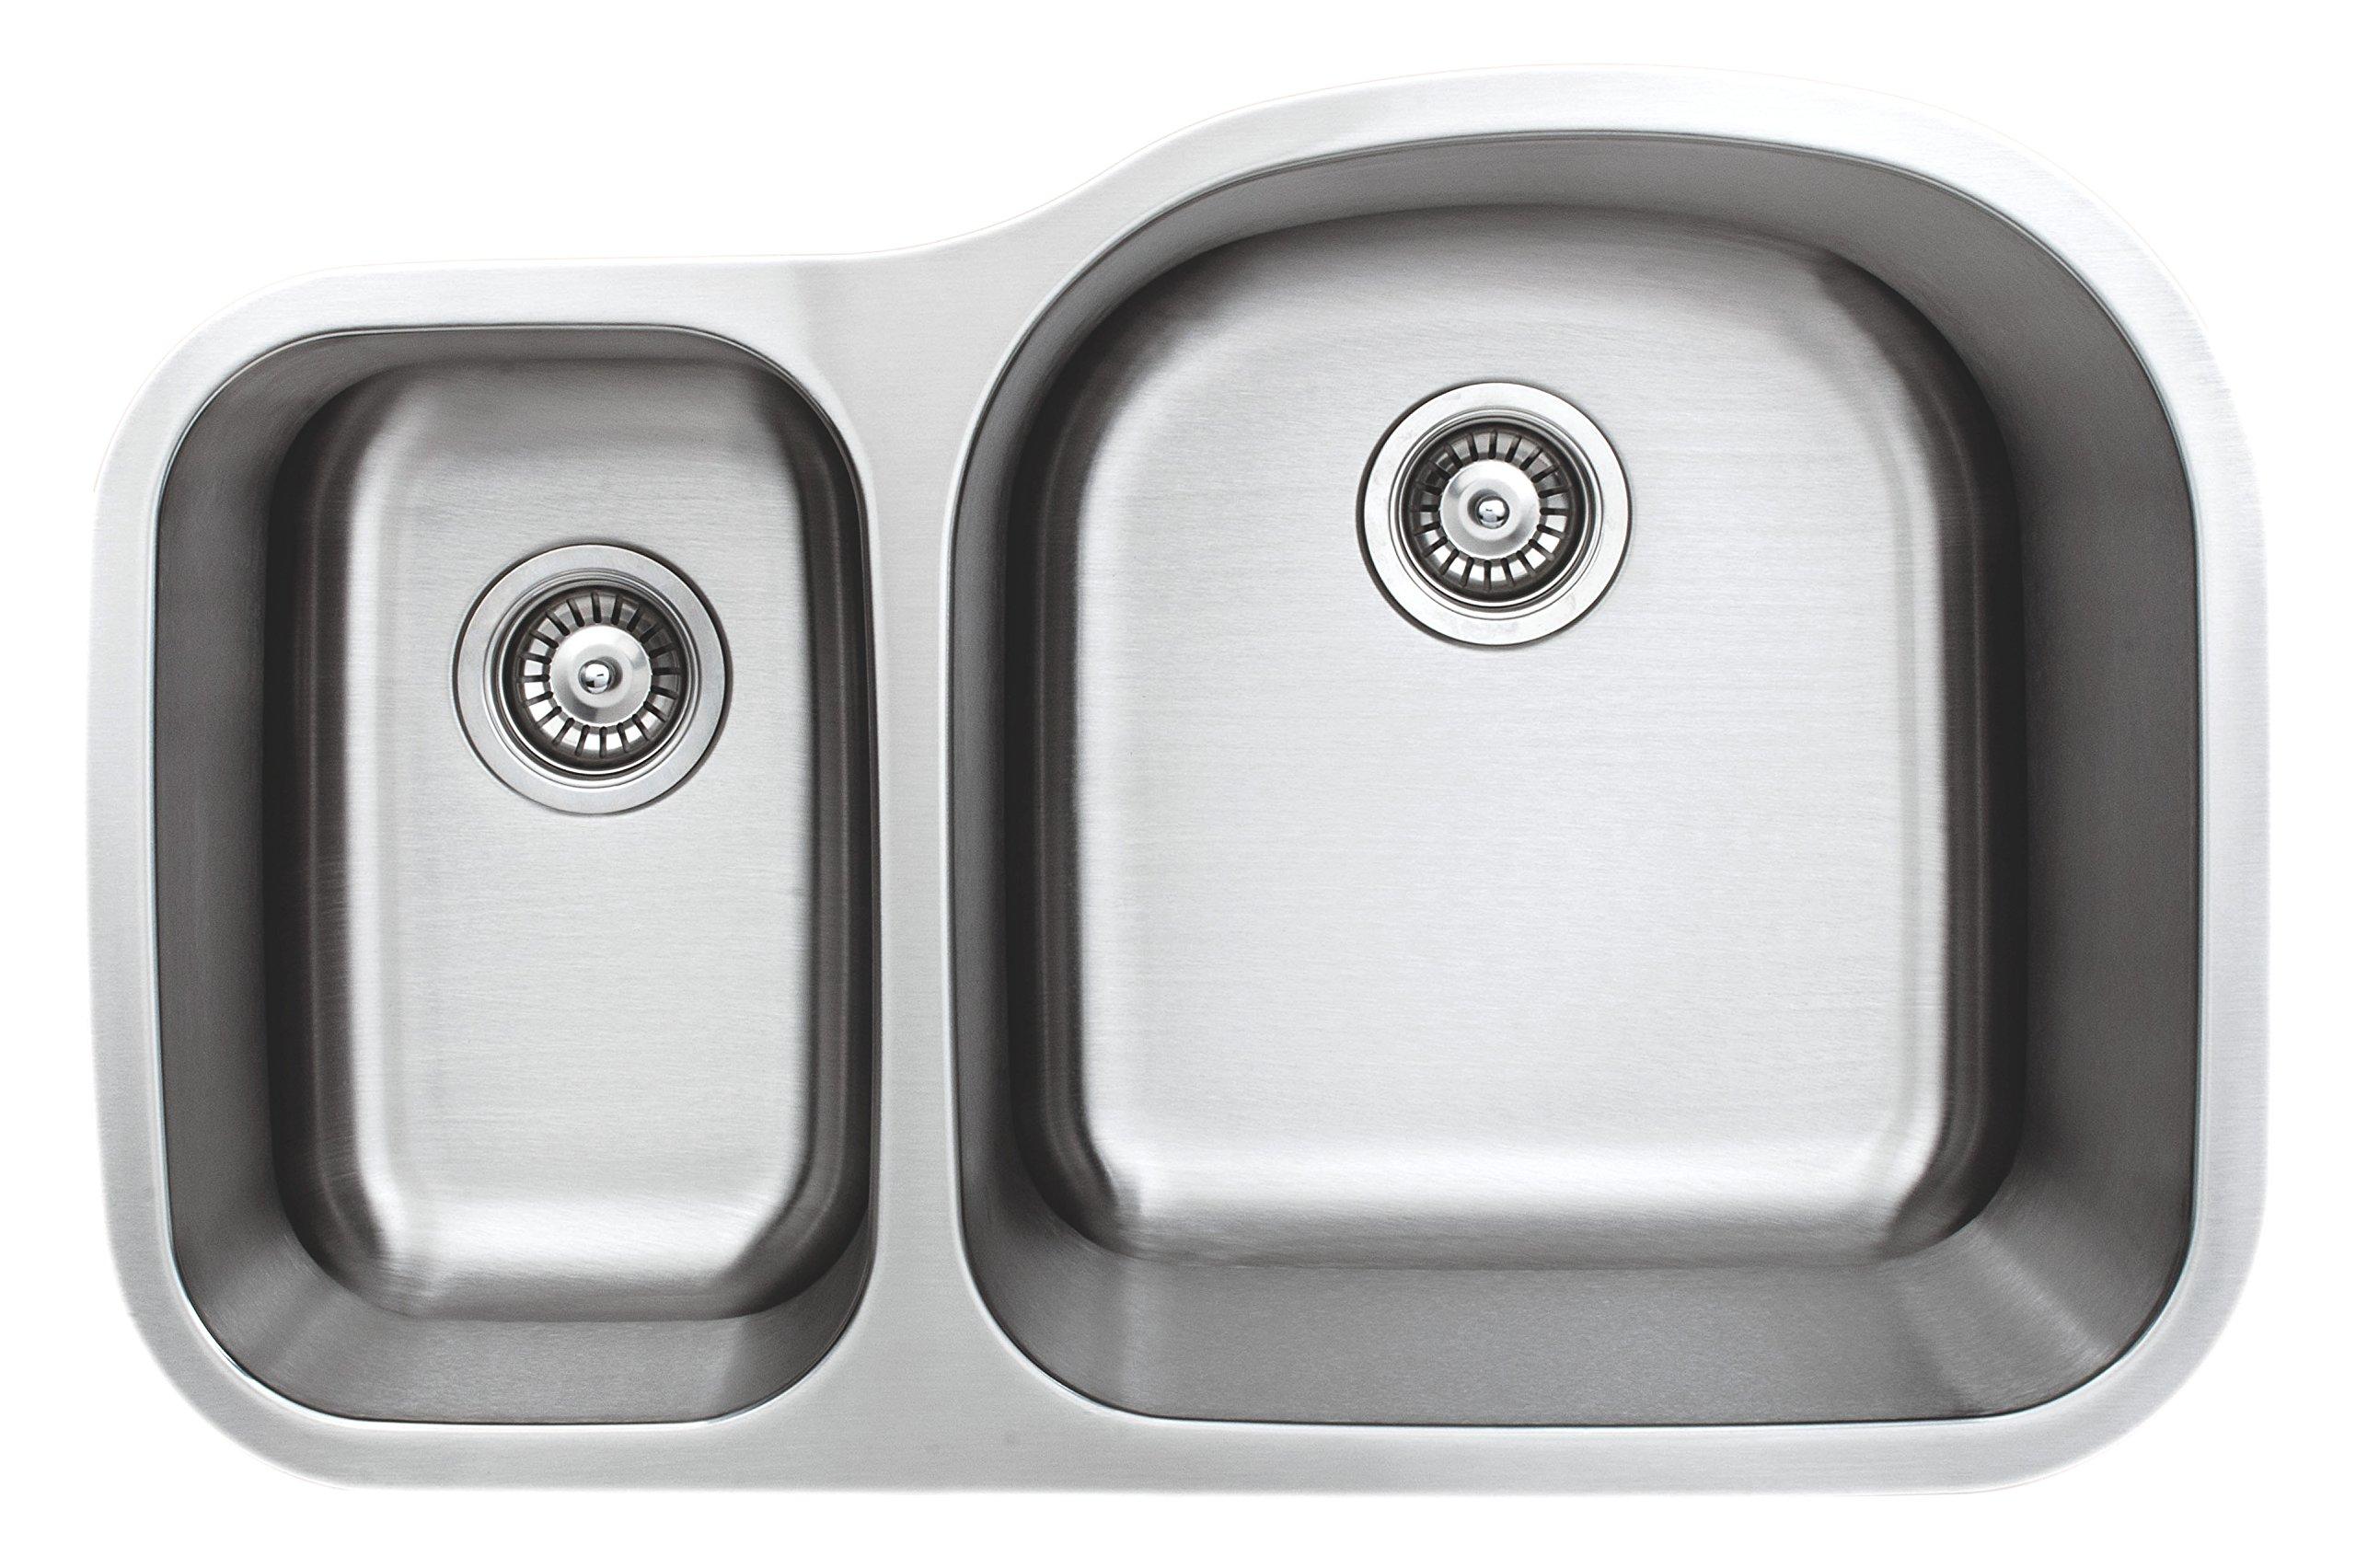 Wells Sinkware CMU3221-79D-16 Craftsmen Series Stainless Steel Kitchen Sink 32'' 40/60 D-shape Brushed Matte Finish